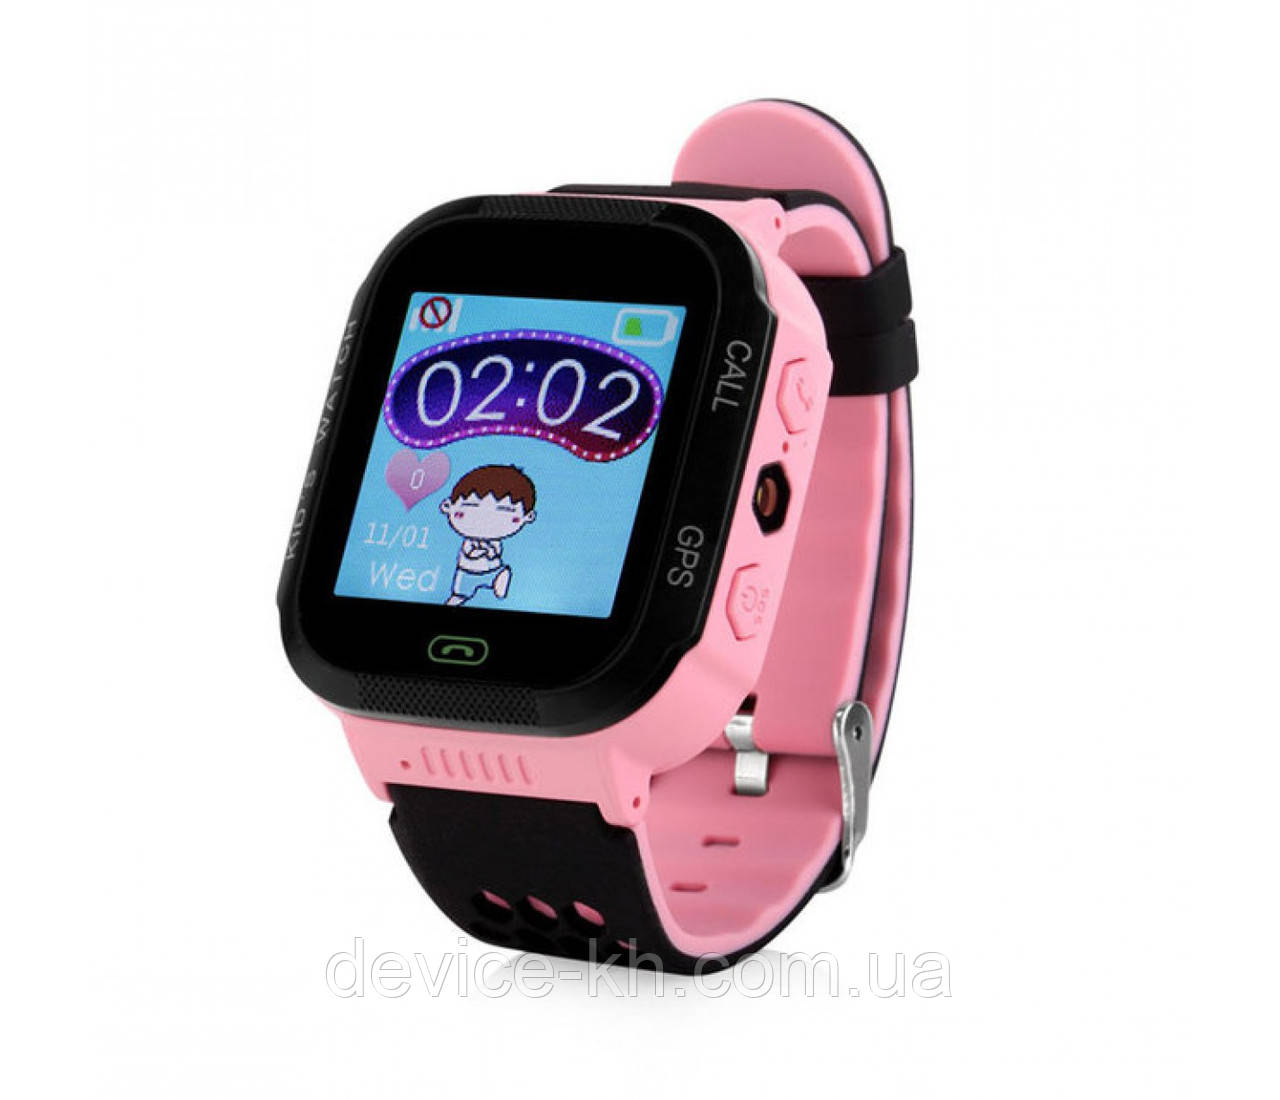 Детские Час Smart Baby Watch Z-3/A-25S c GPS Трекером Камера Шагомер, фото 1